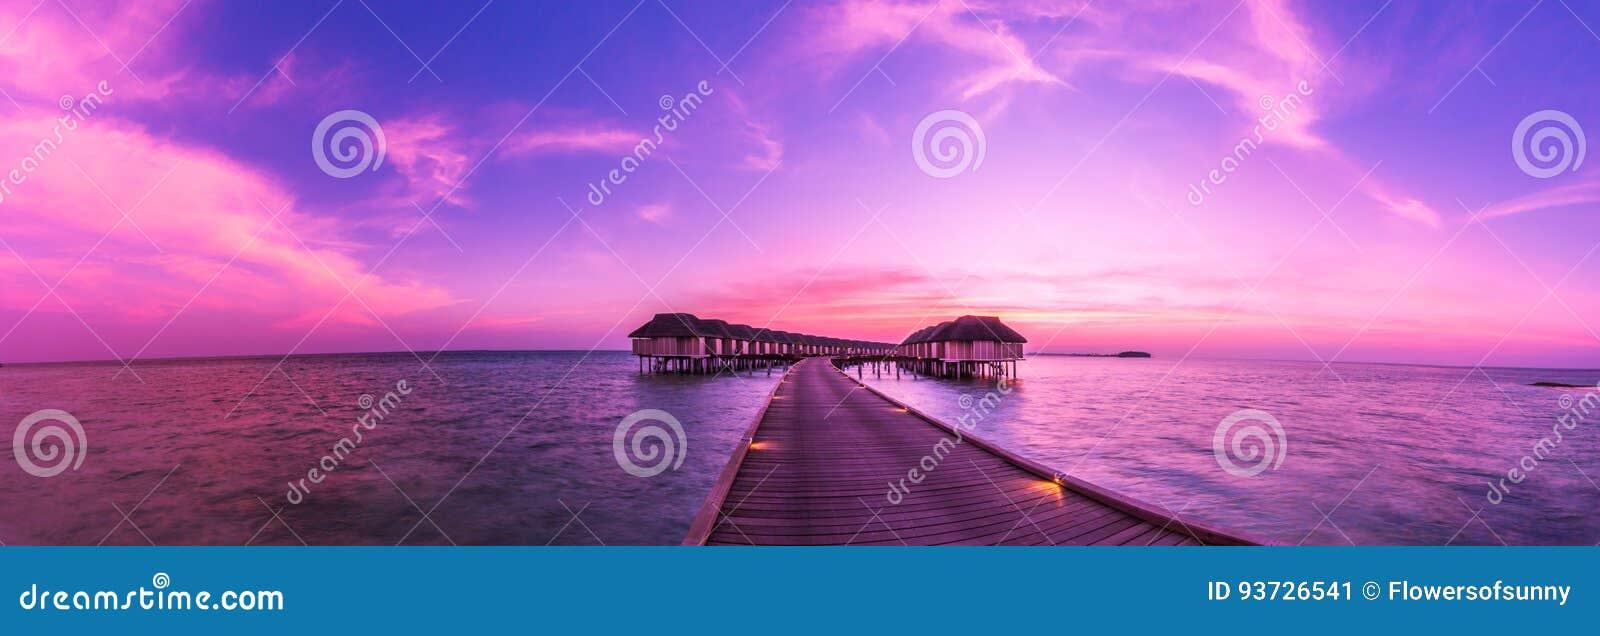 Pink scallop seashell 海滩美好的横向 热带本质的场面 棕榈树和蓝天 暑假和假期概念